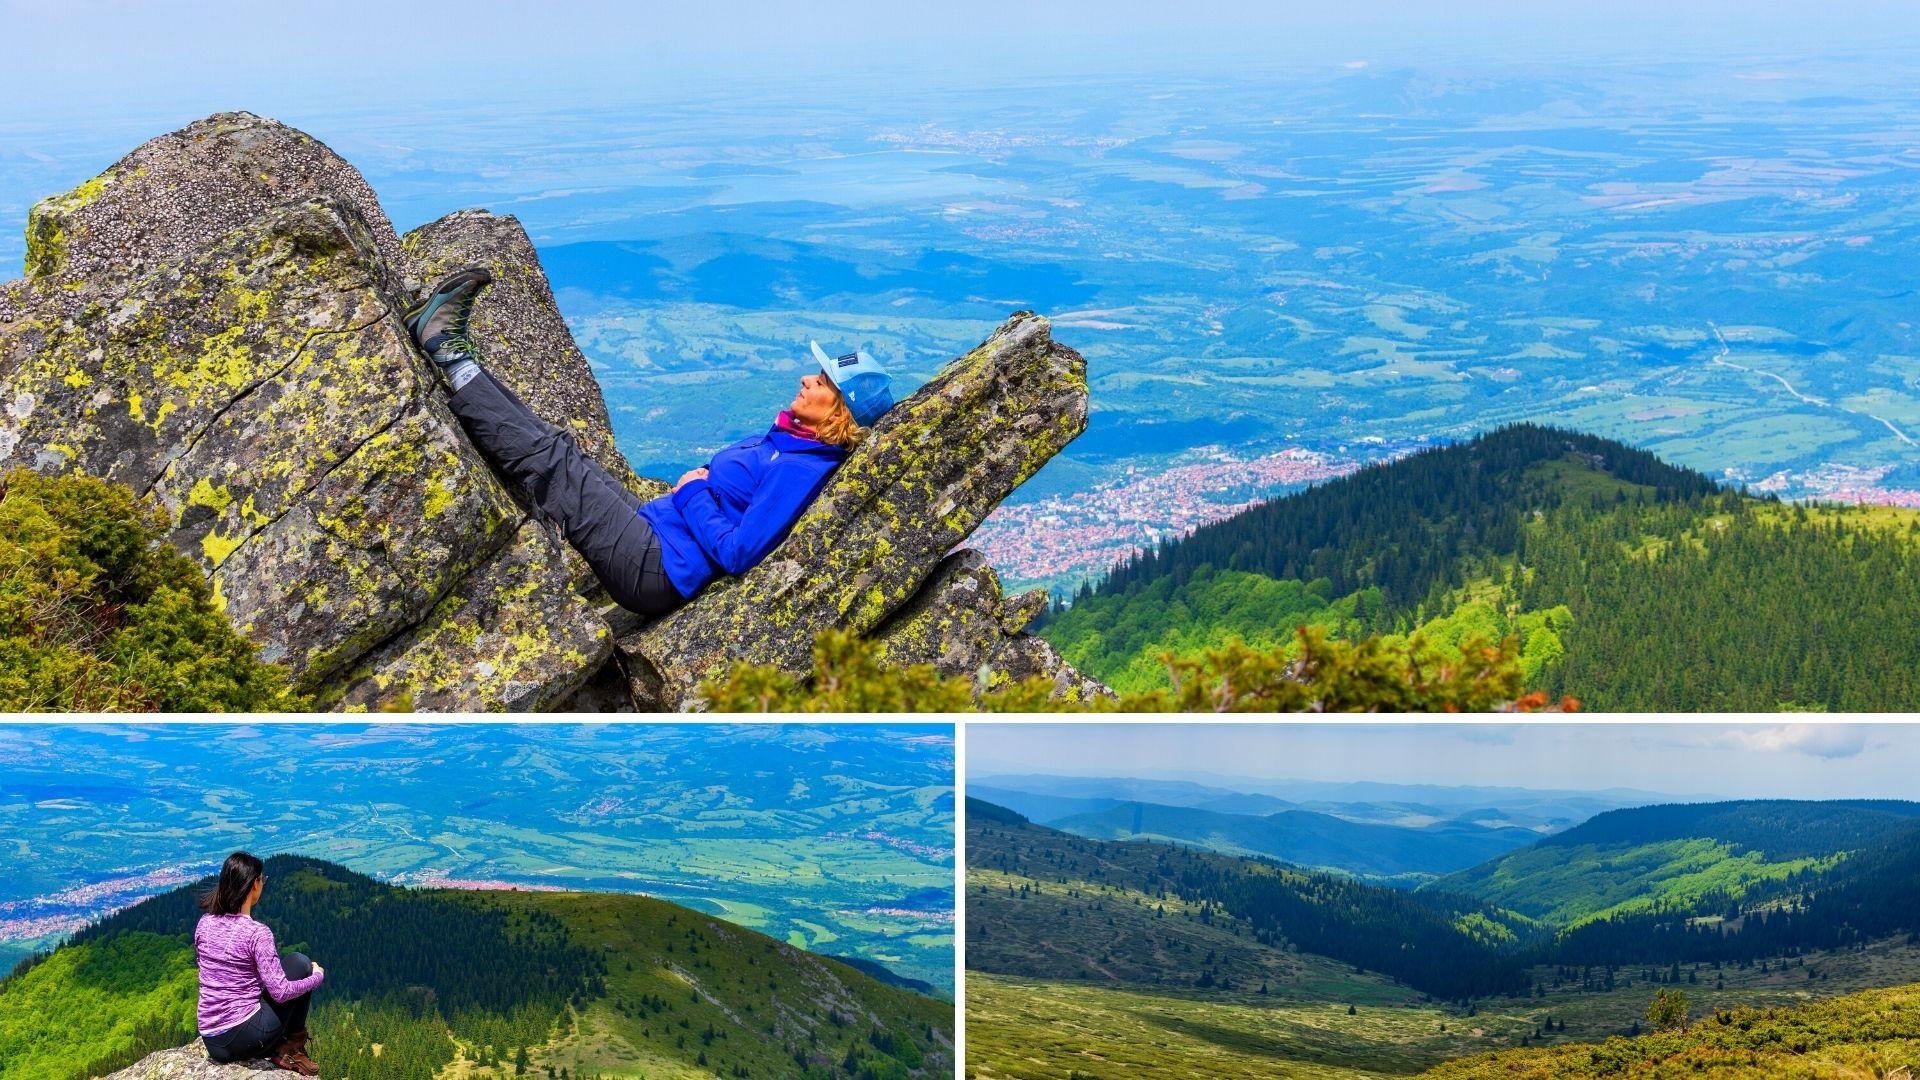 Връх Ком, Стара планина, планниски преход за начинаещи4